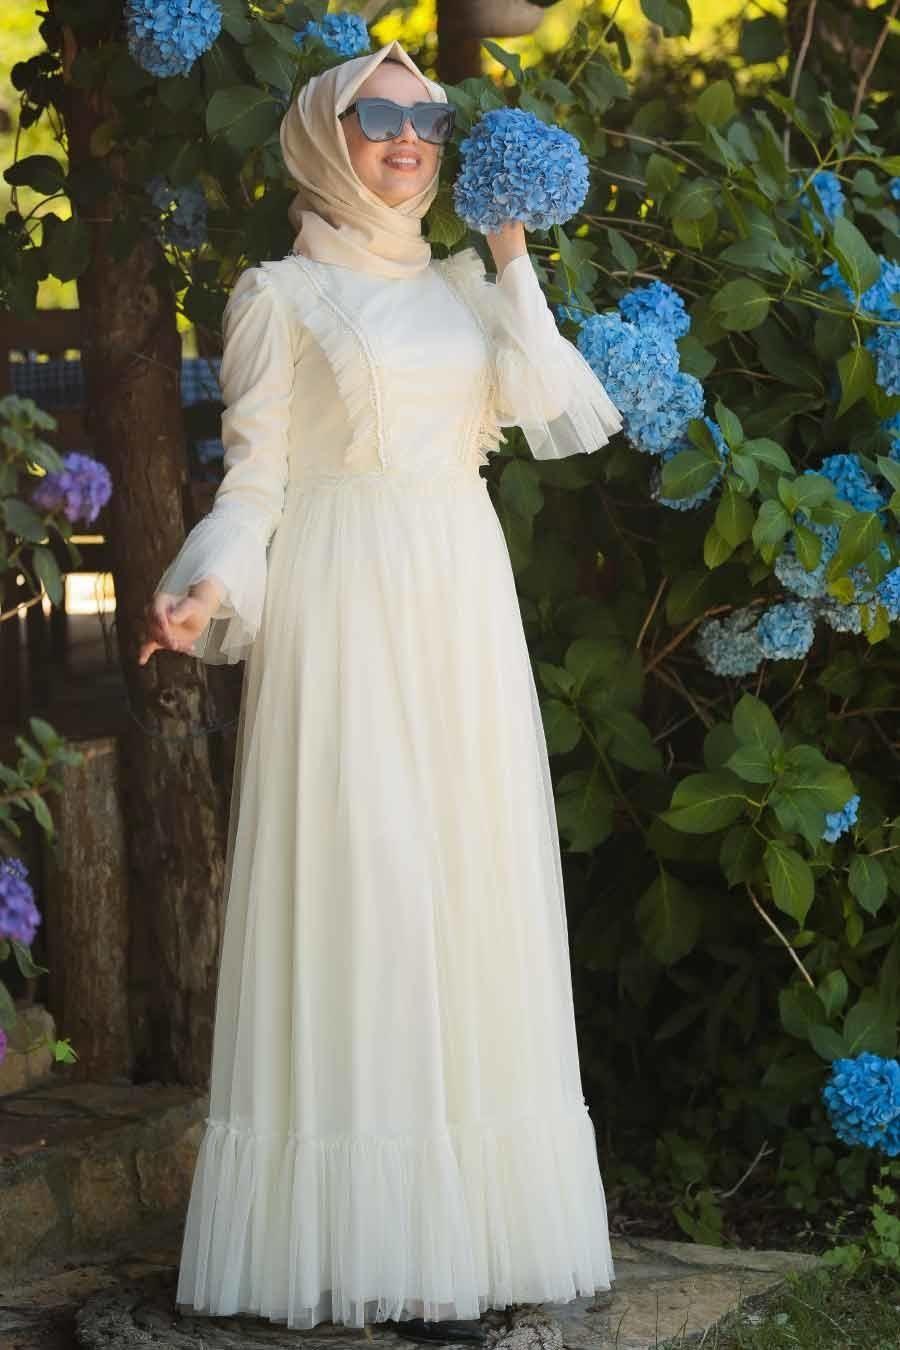 Tesetturlu Abiye Elbise Boncuk Detayli Ekru Tesettur Abiye Elbise 38980e Tesetturisland Com Gelinlik Elbise The Dress